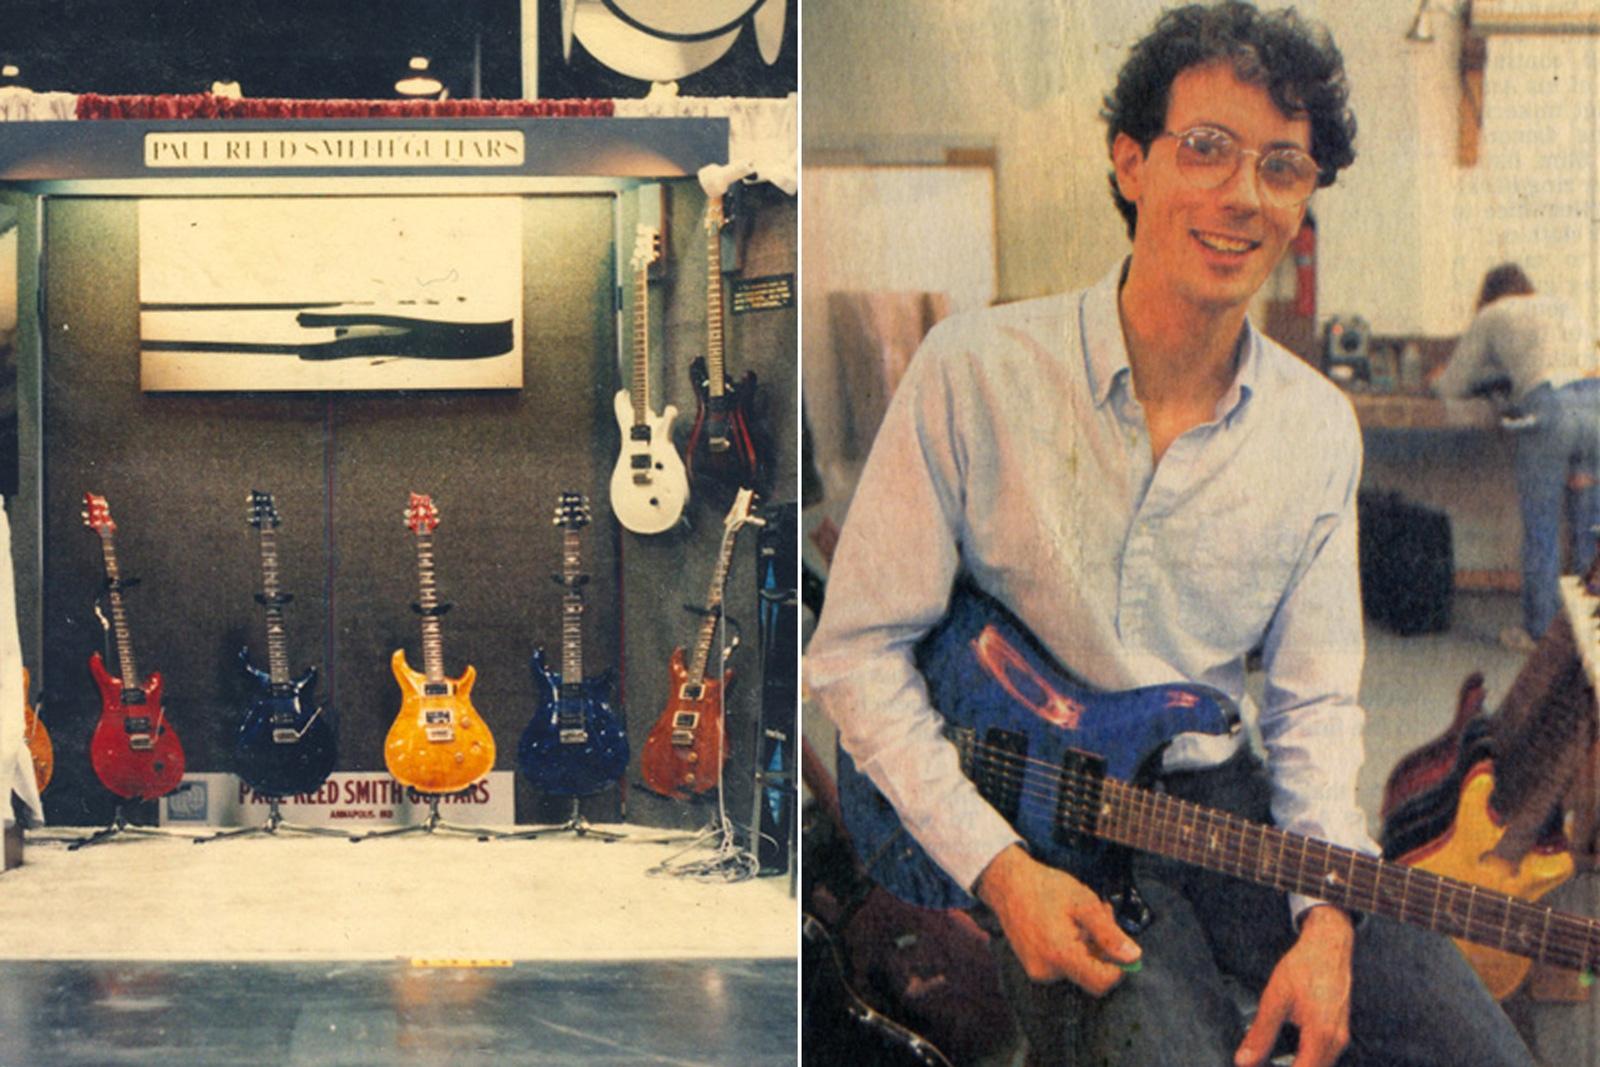 Paul Reed Smith at NAMM 1985